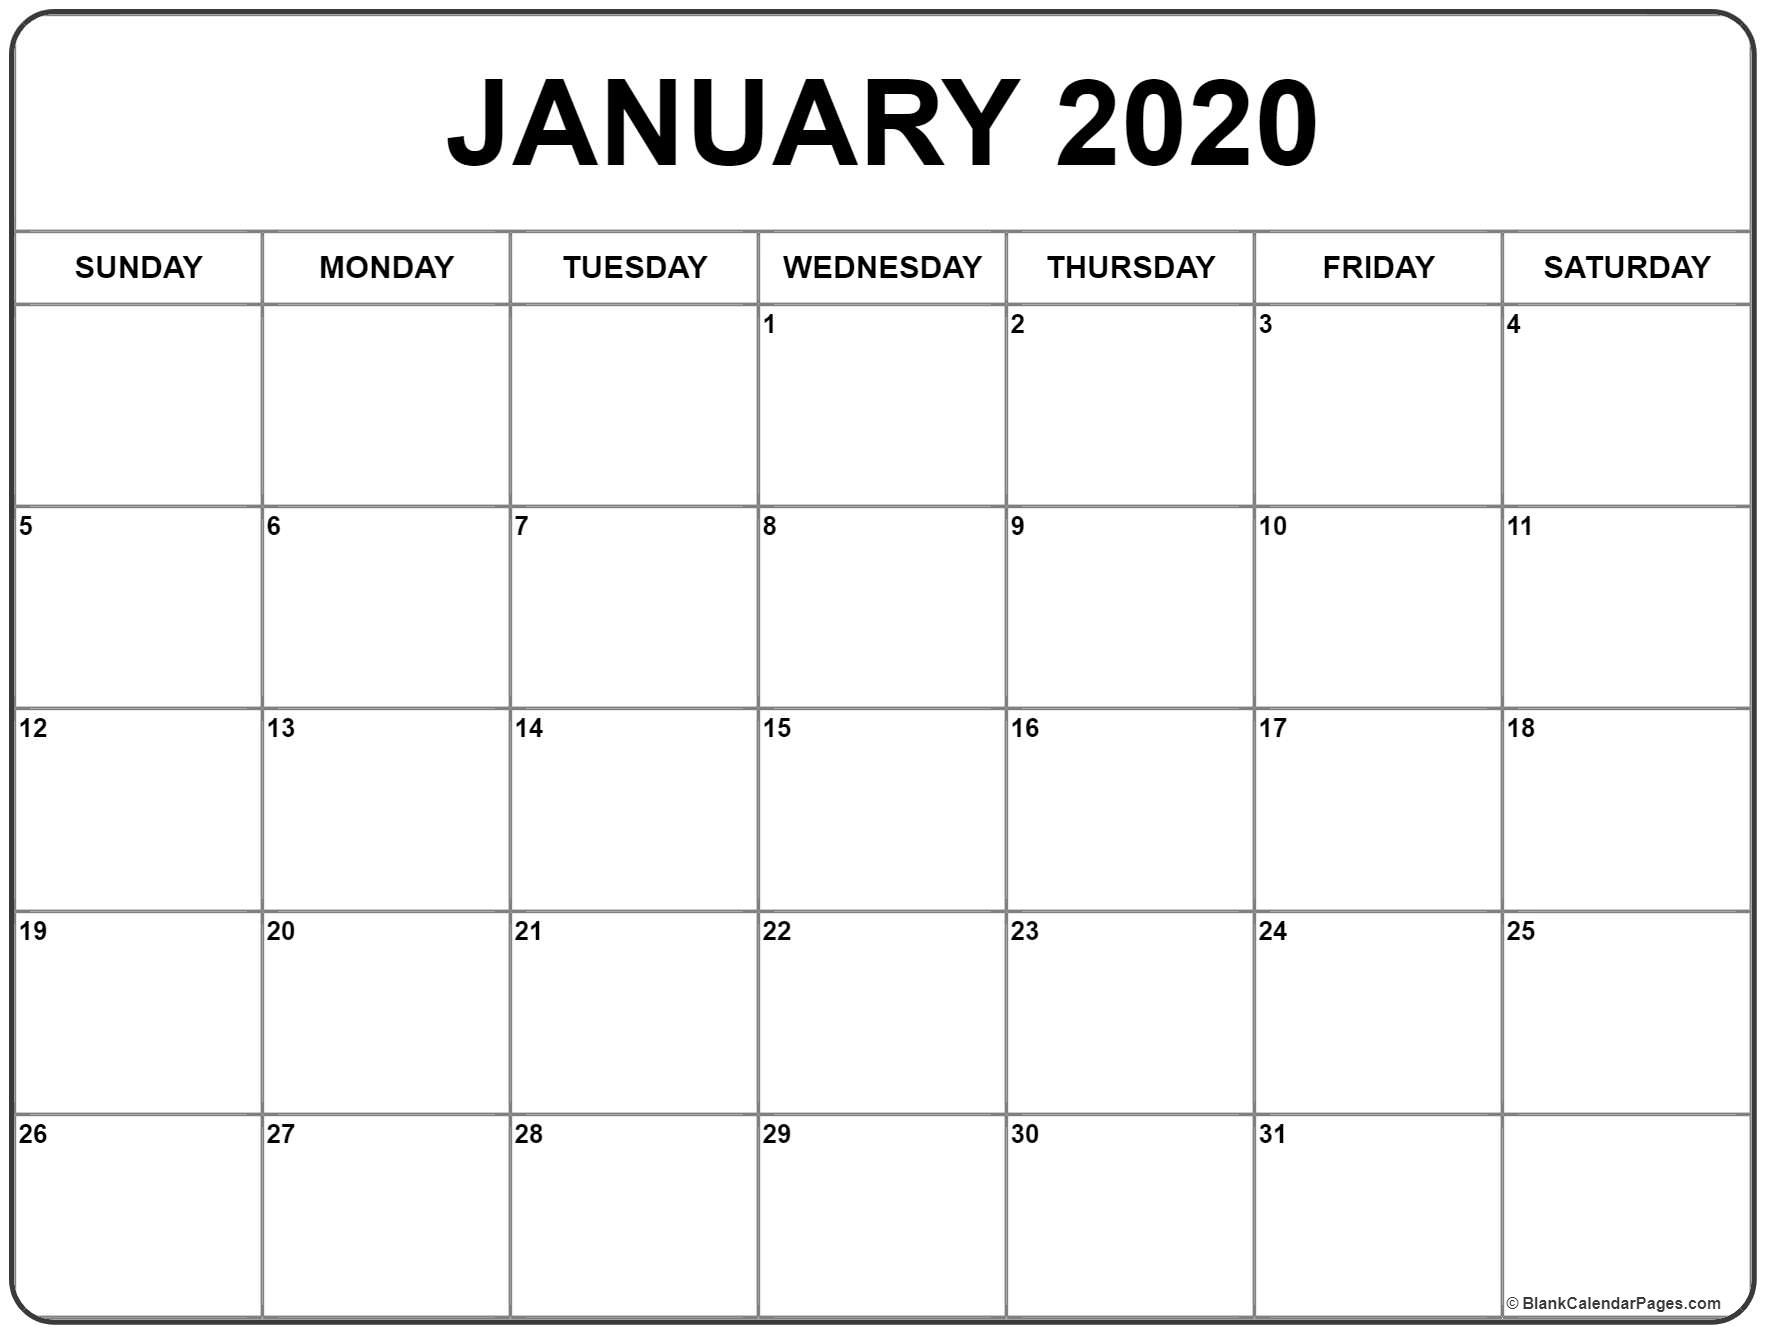 January 2020 Calendar | Free Printable Monthly Calendars-Fillable January 2020 Calendar